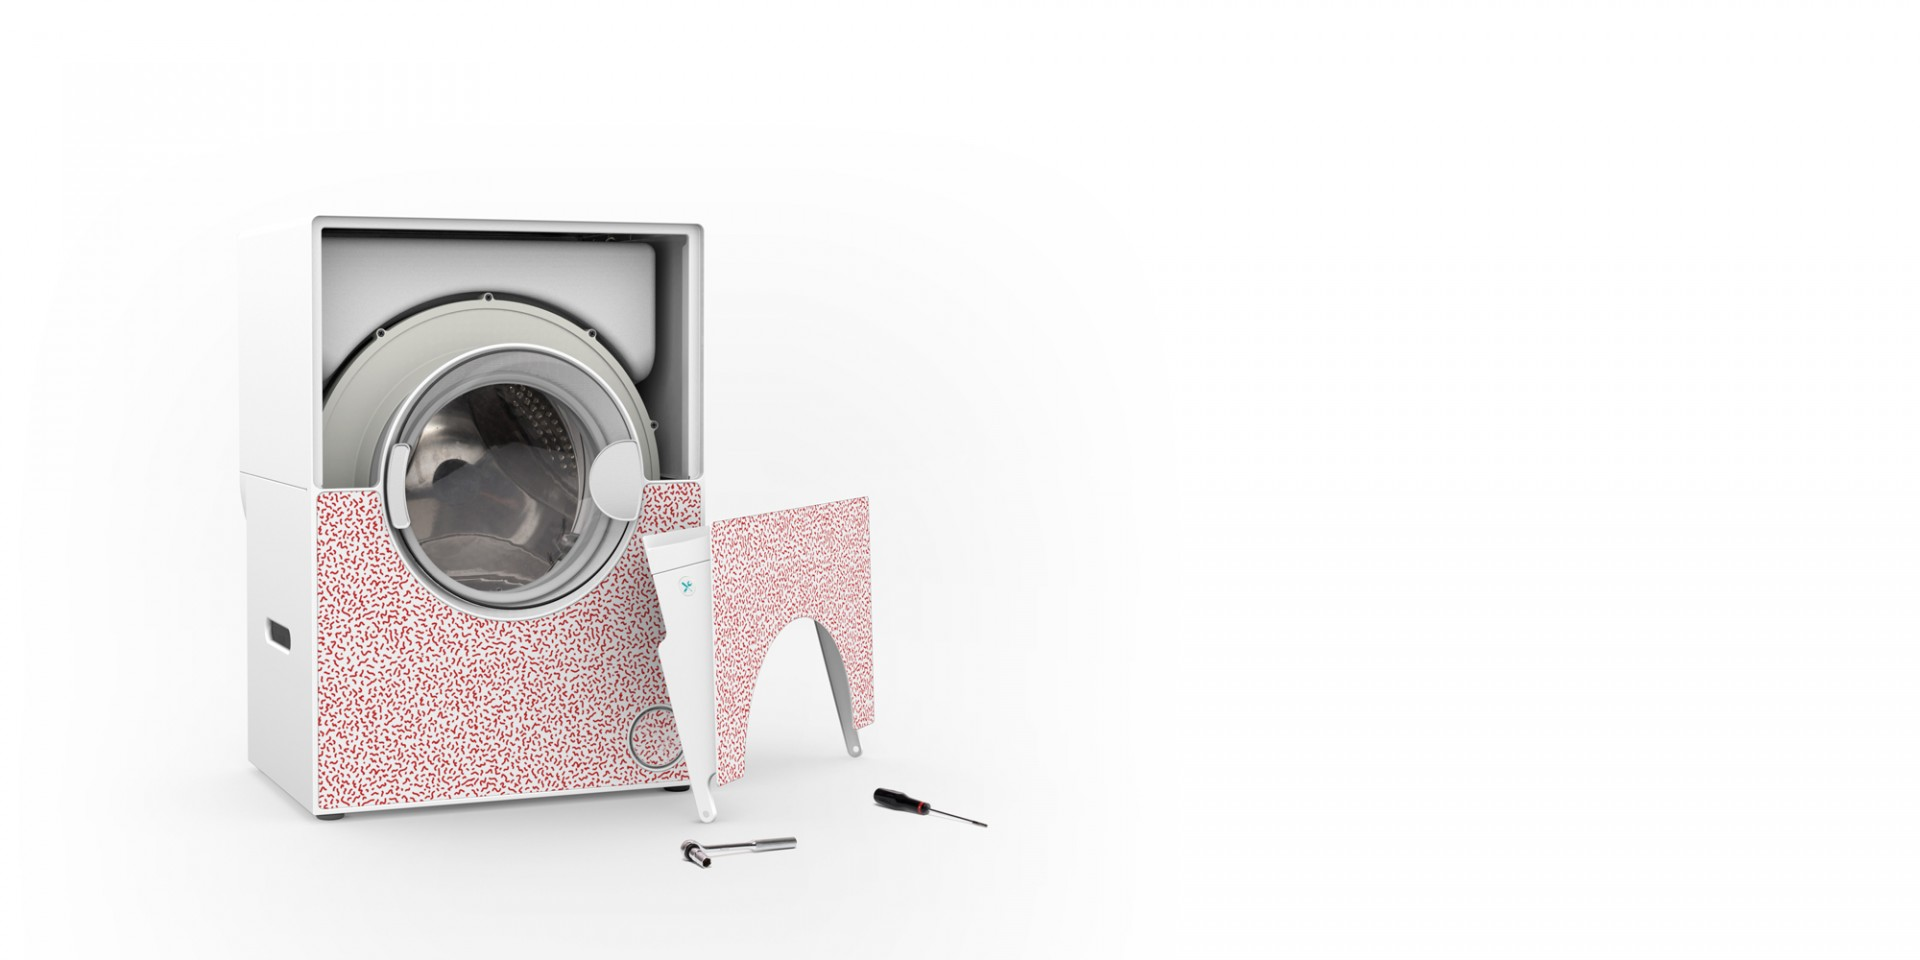 jeter machine laver congelateur tiroir. Black Bedroom Furniture Sets. Home Design Ideas